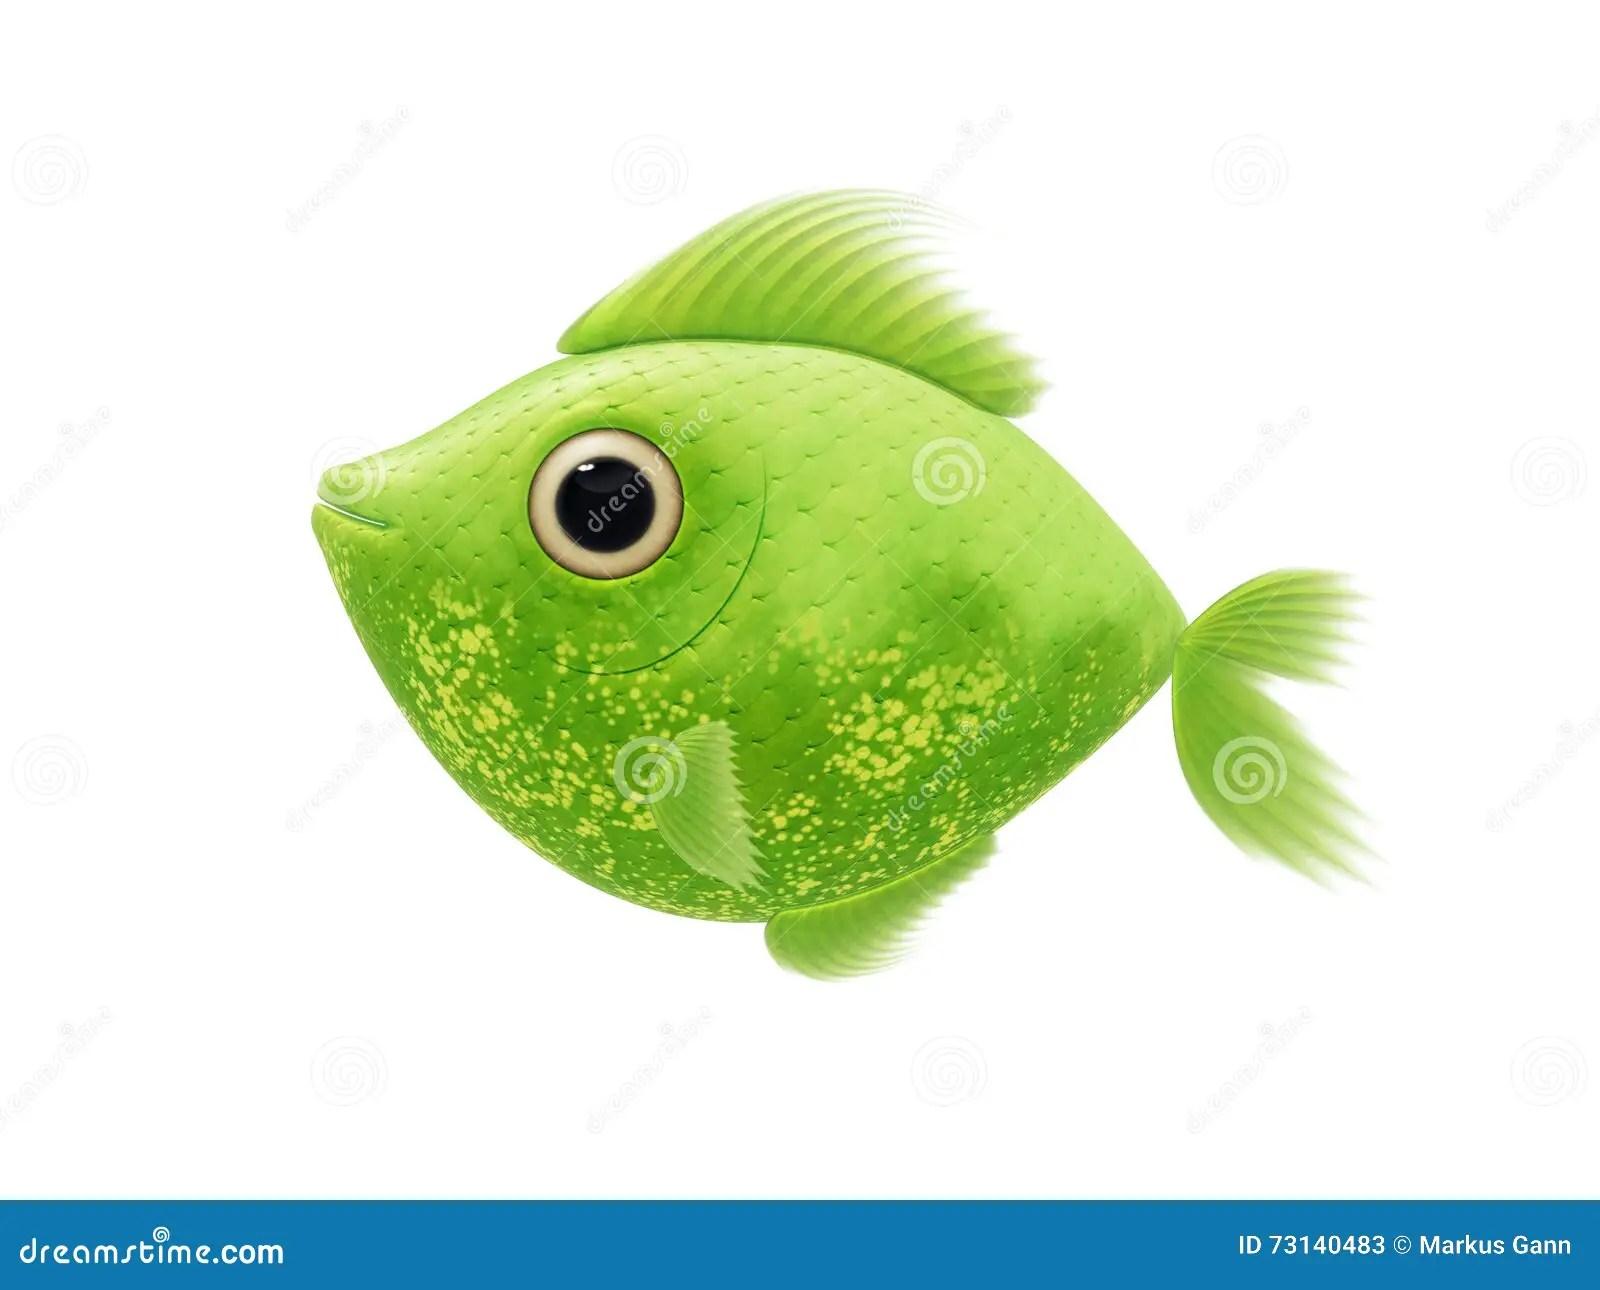 Green Animal Print Wallpaper Green Fish Stock Illustration Illustration Of Fishing